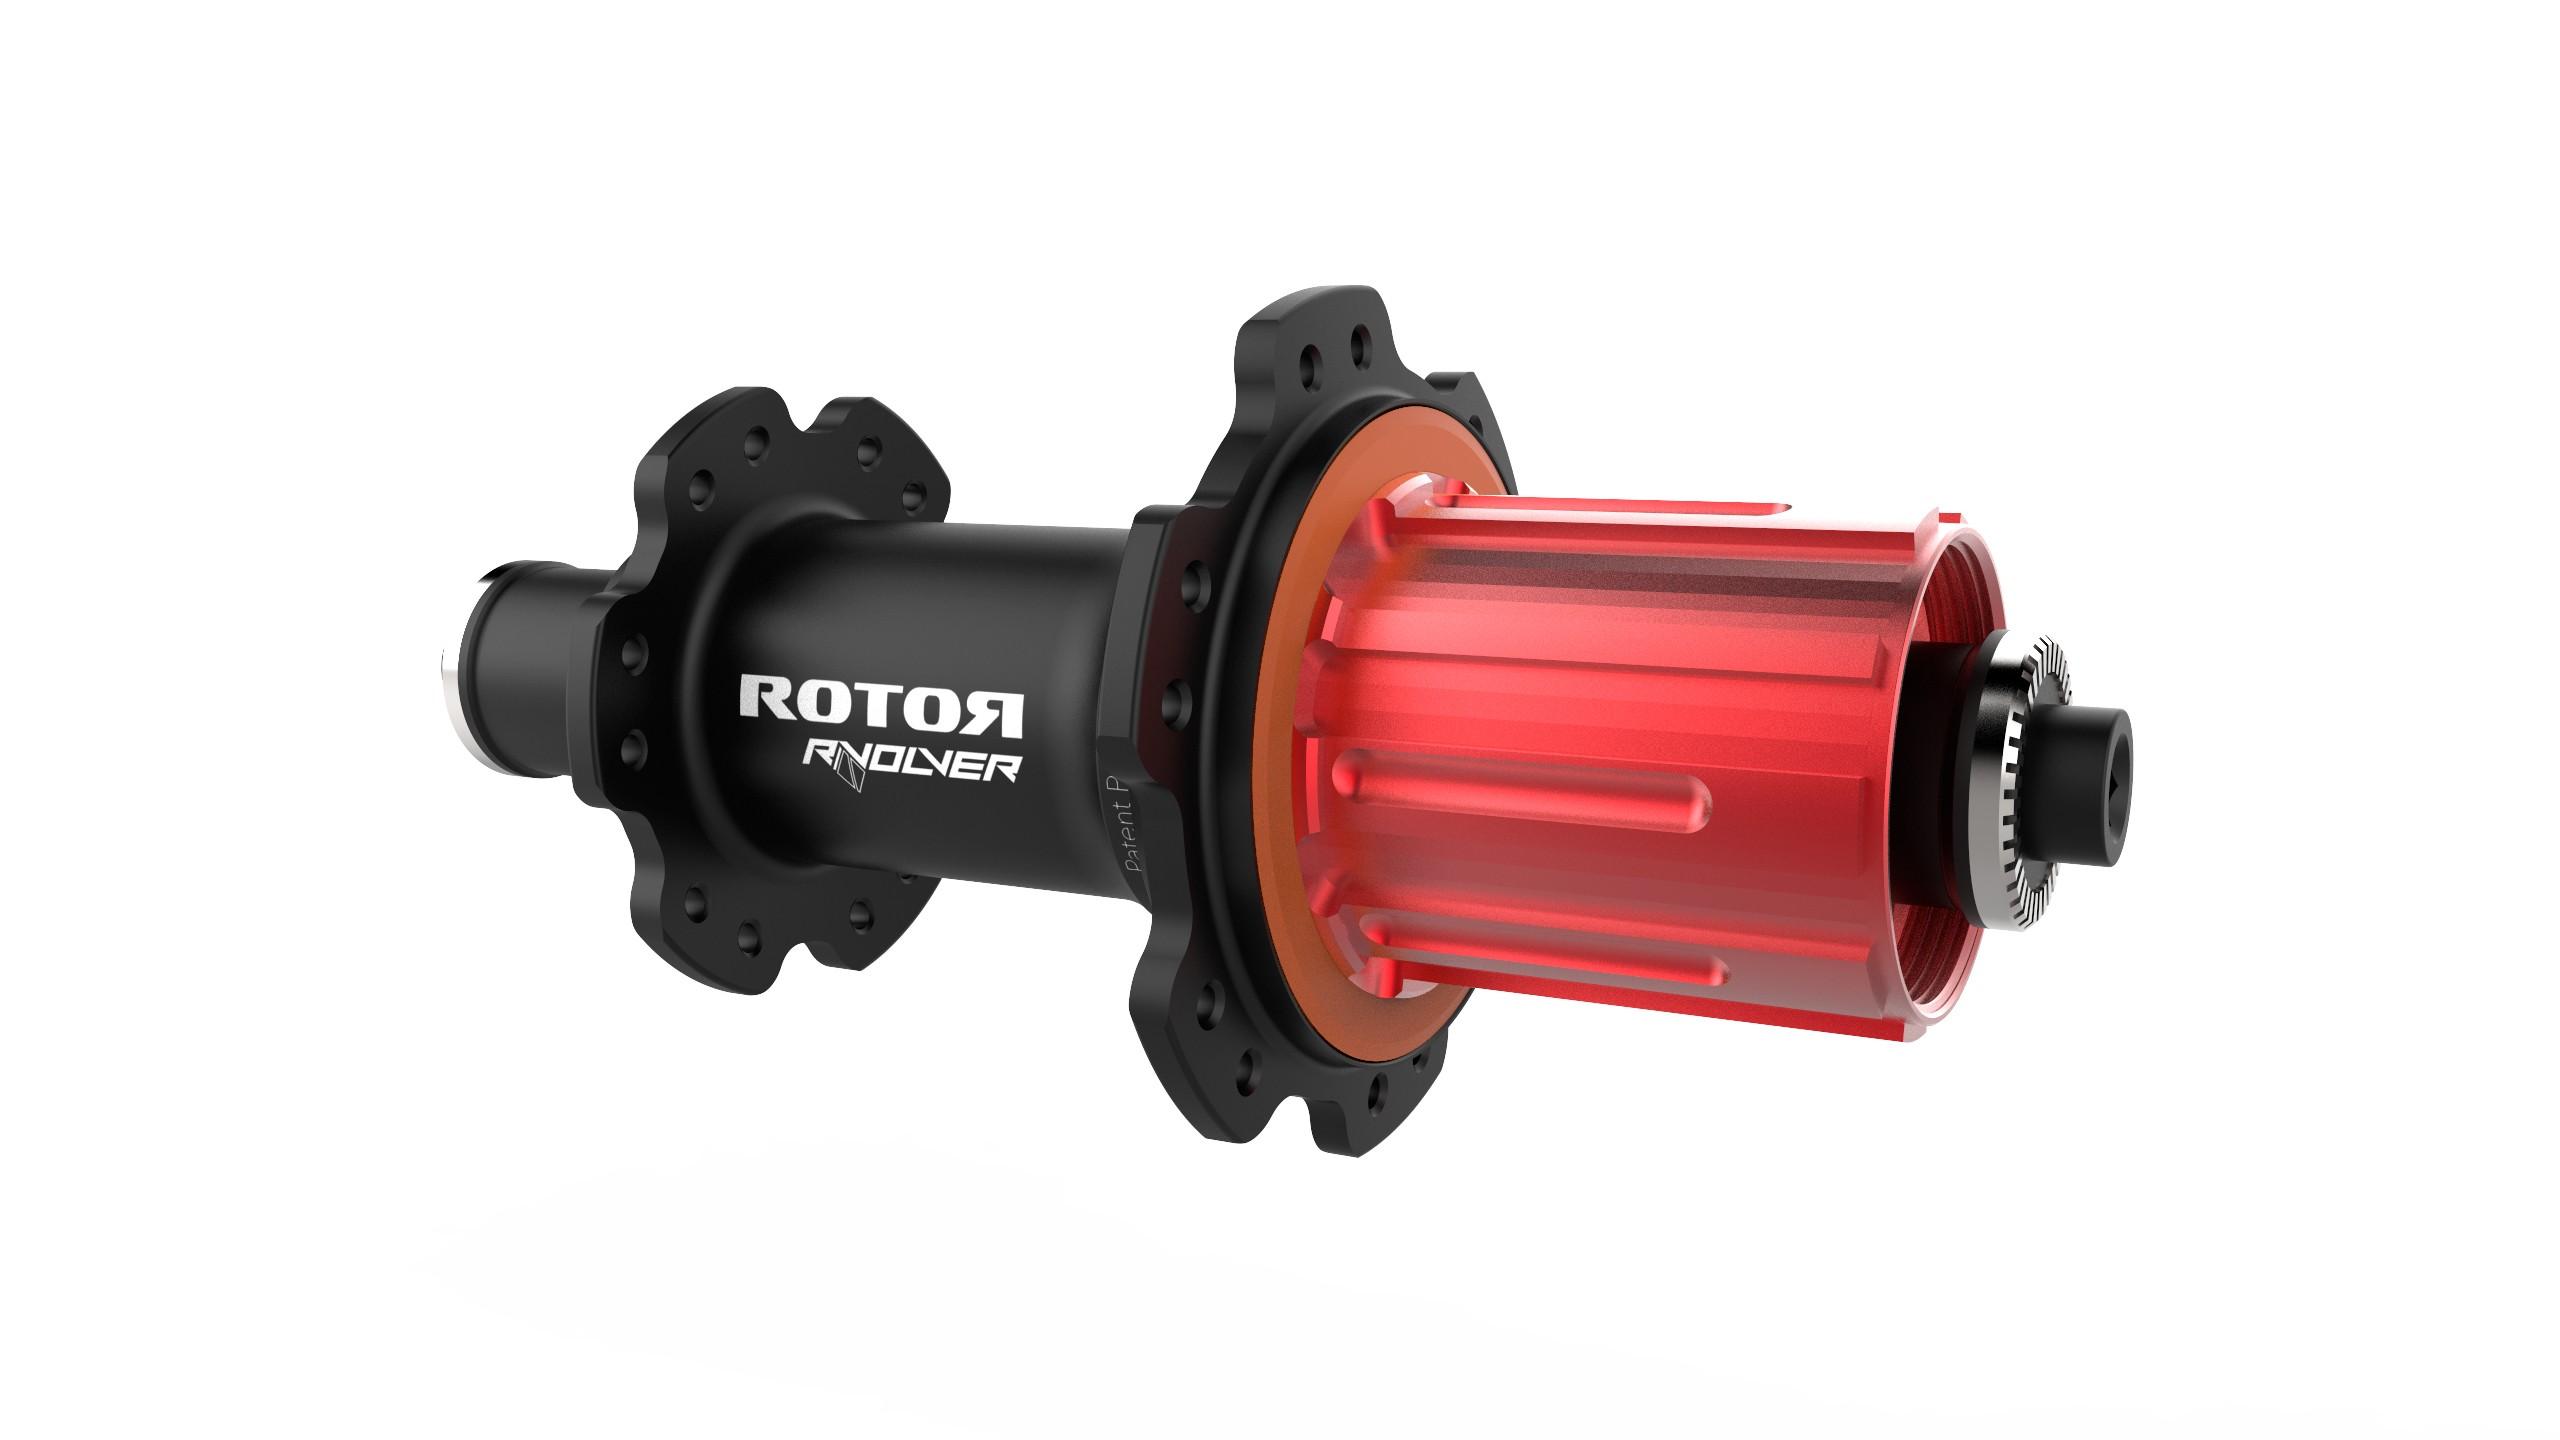 The rim brake version of Rotor's new RVOLVER road hub